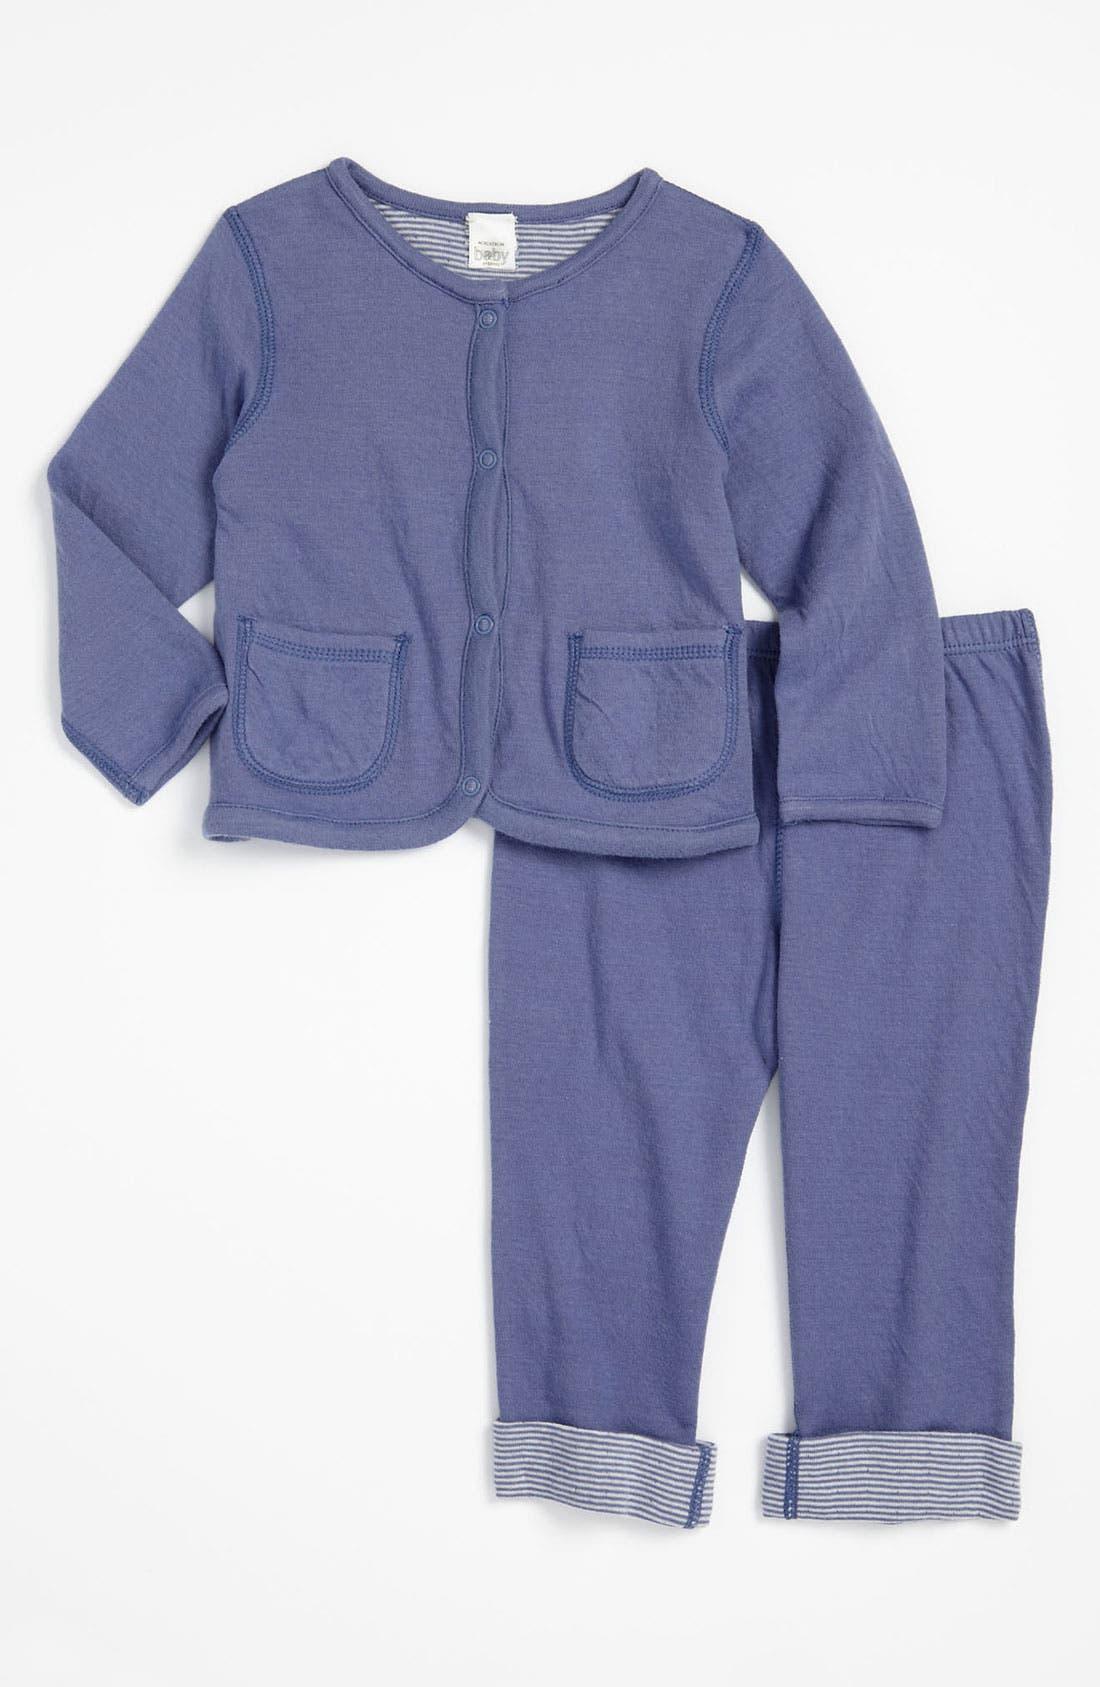 Alternate Image 1 Selected - Nordstrom Baby Reversible Jacket & Leggings (Infant)